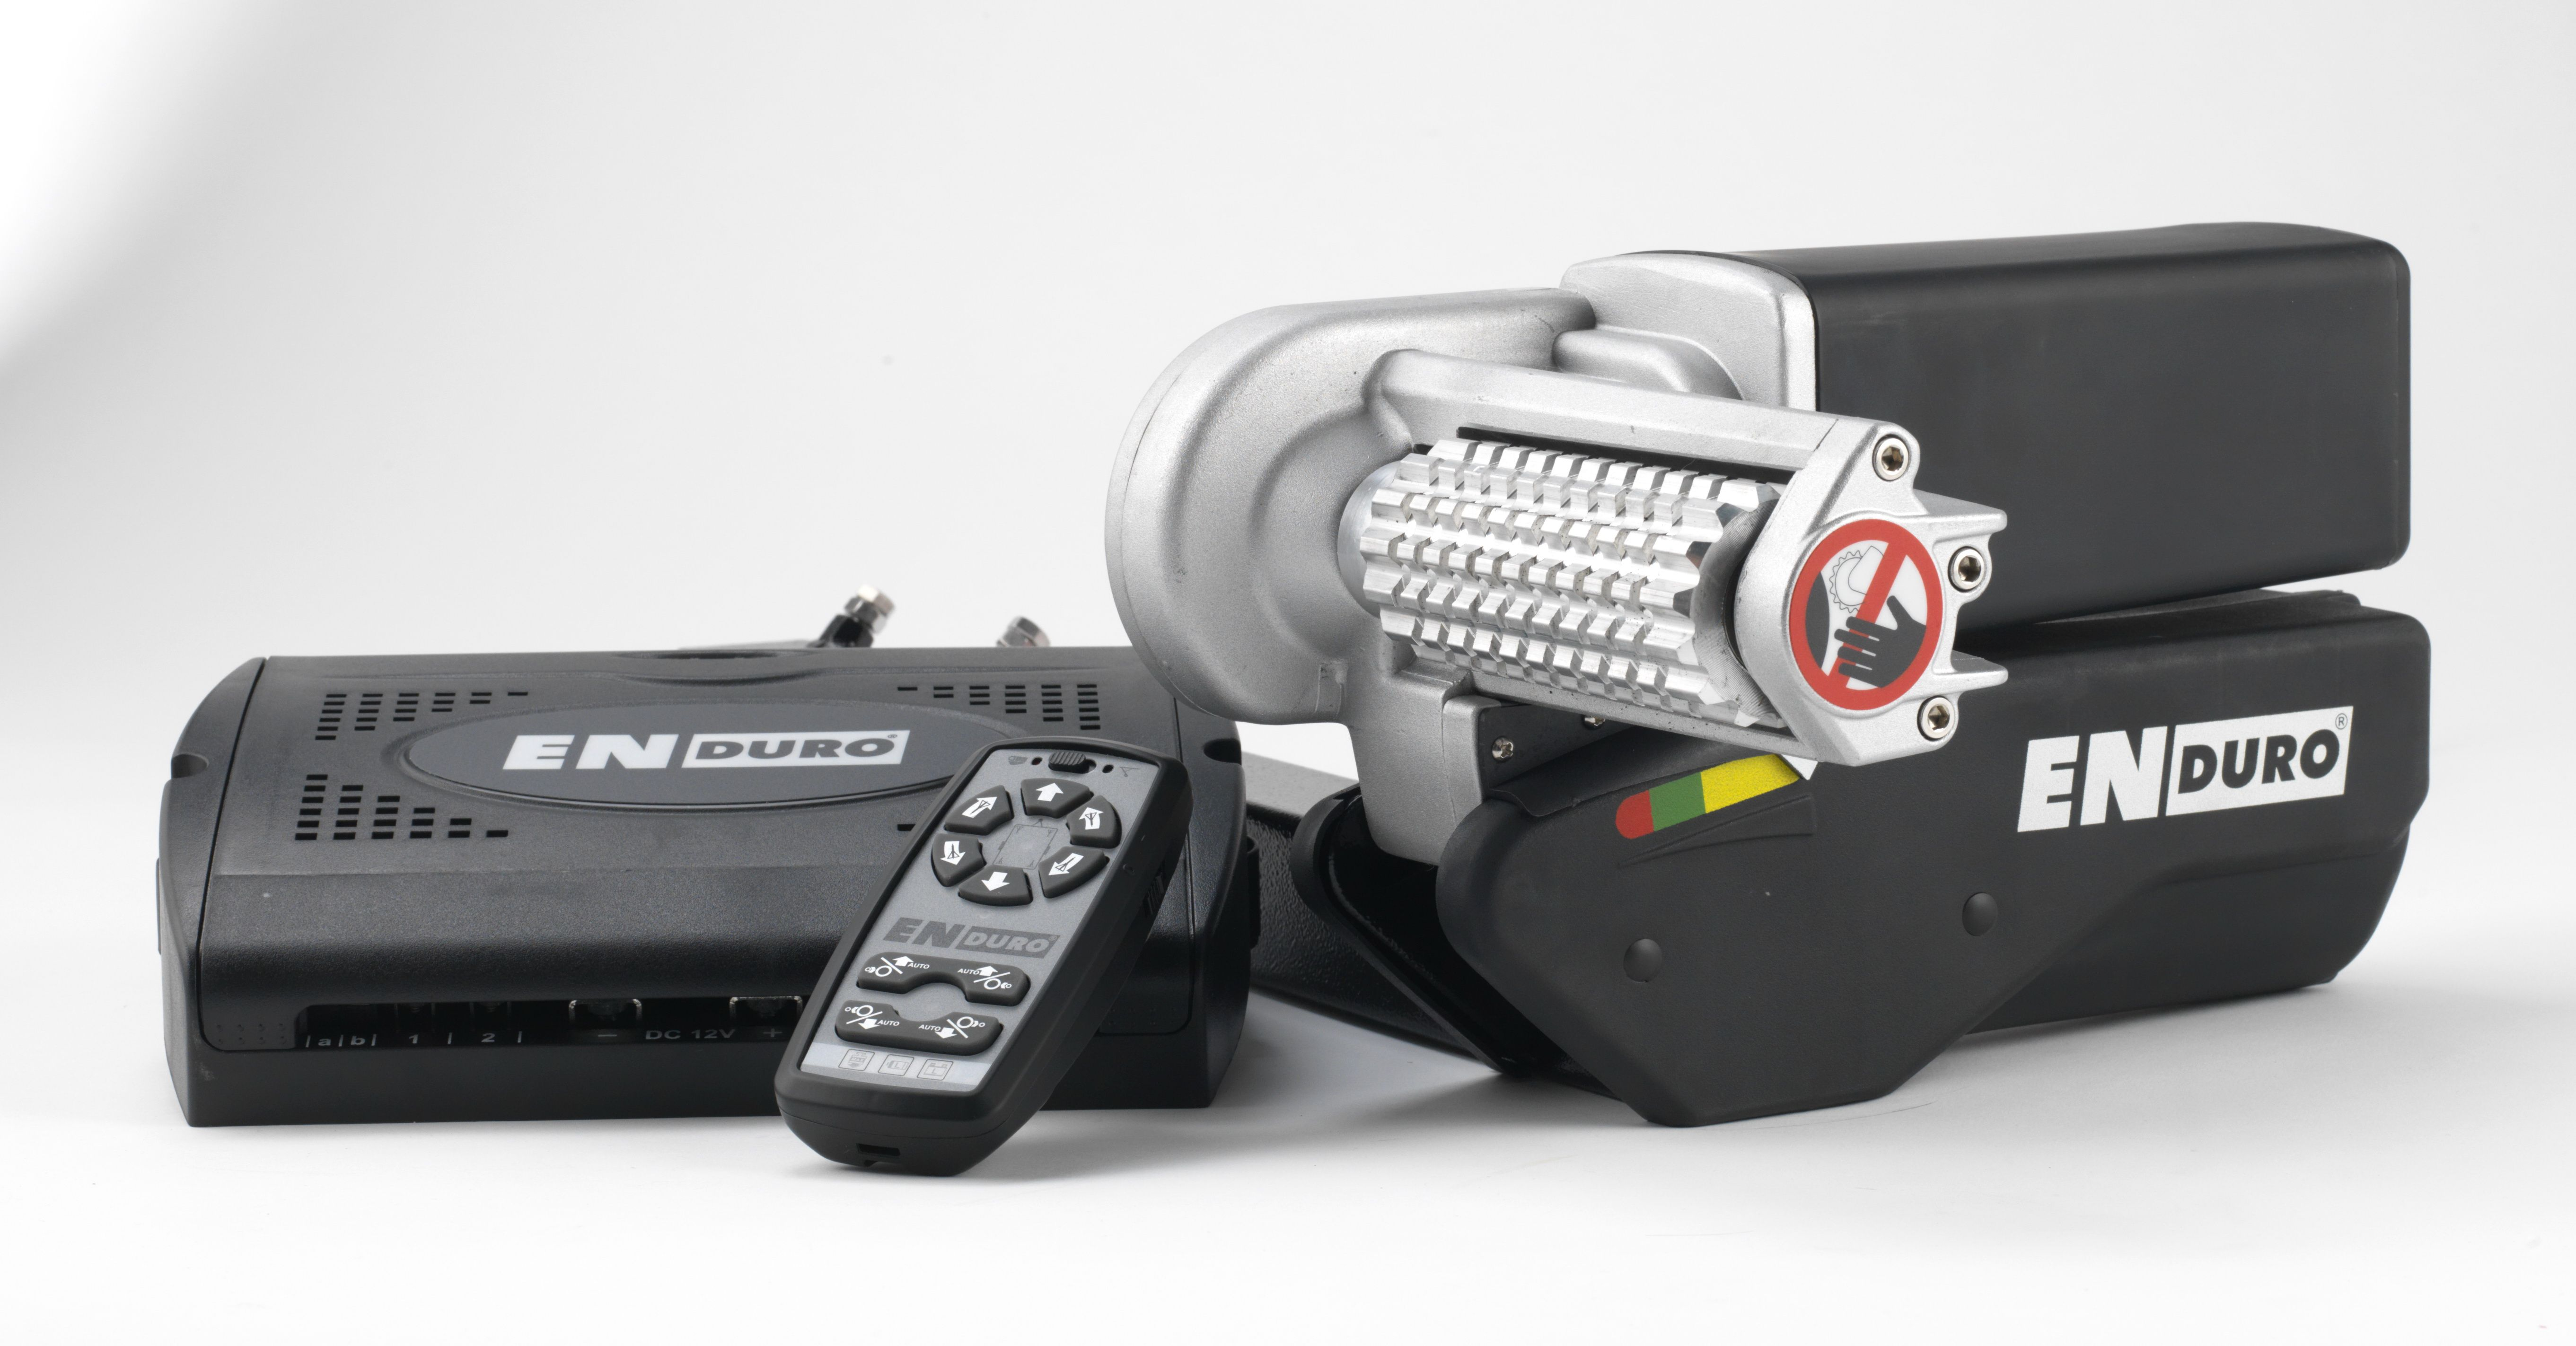 Enduro mover Premium med automatisk tilkobling til campingvognen